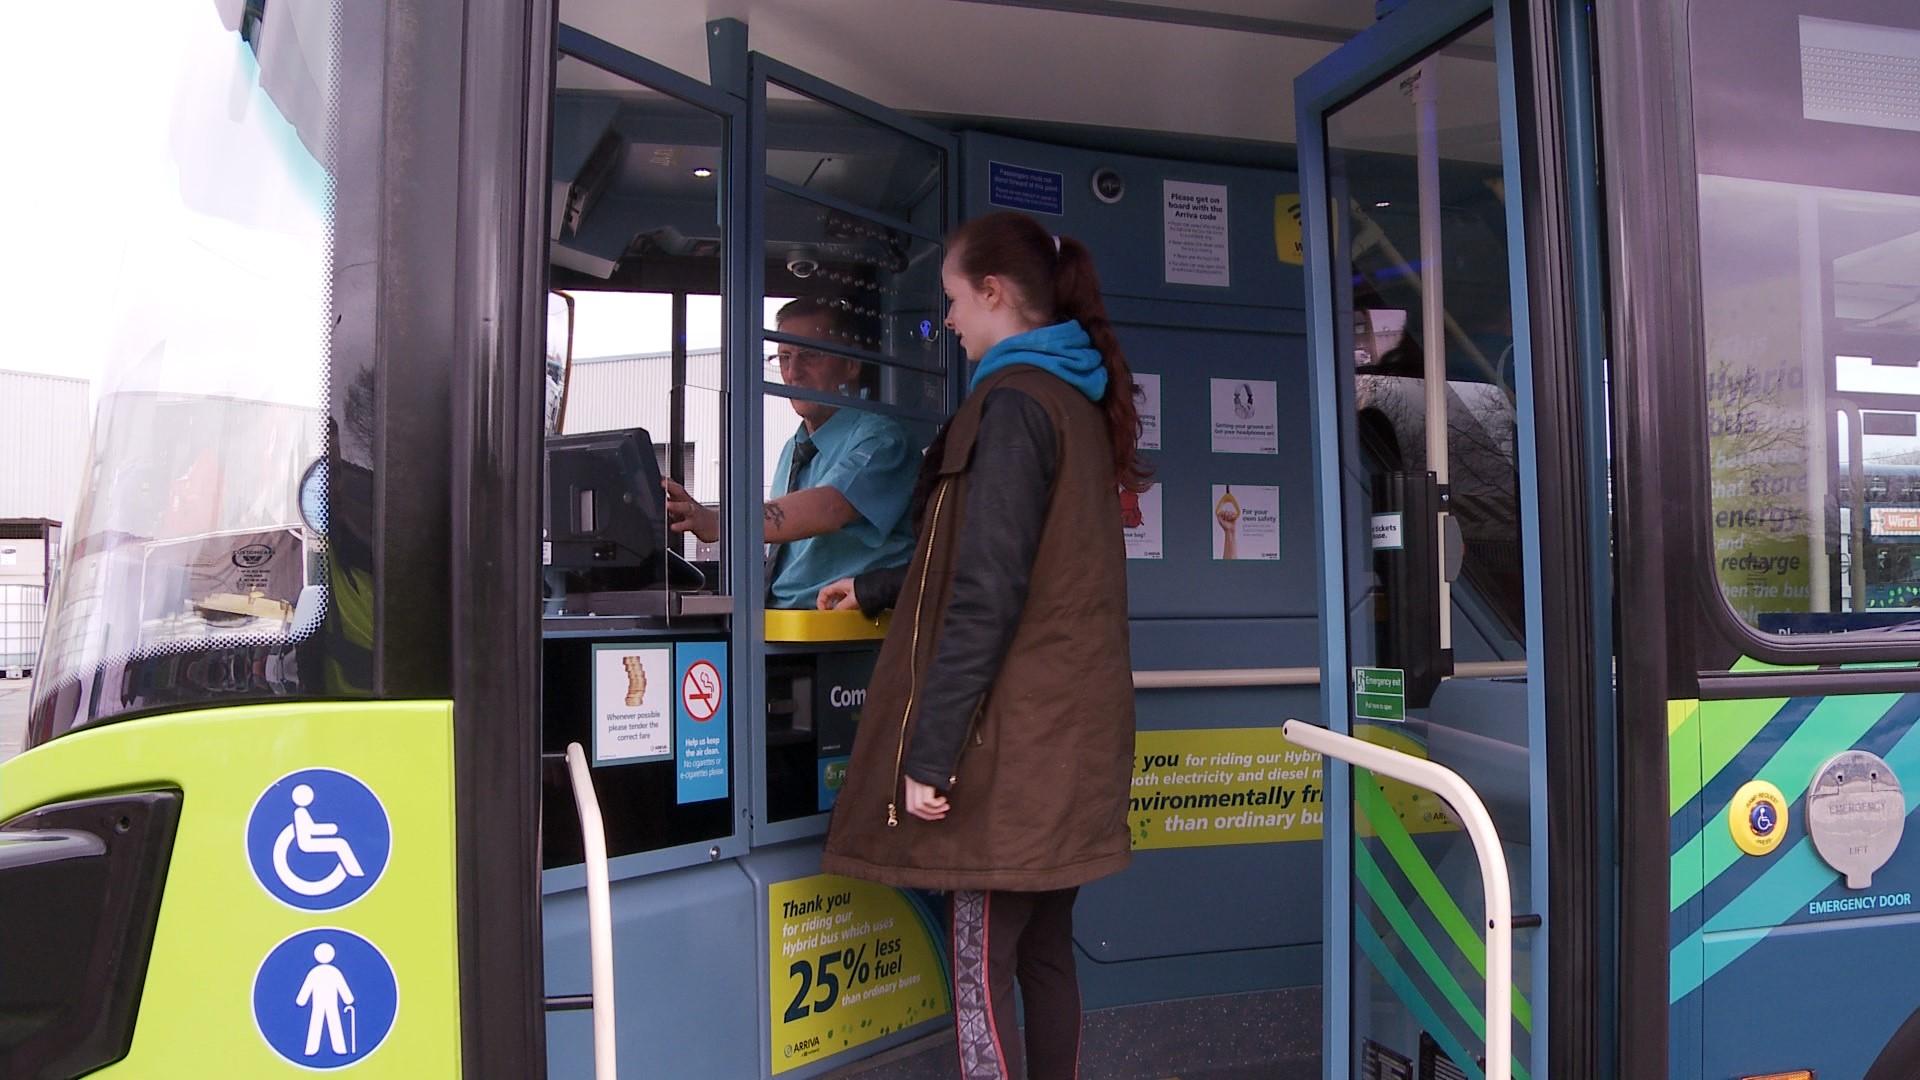 Courtney boarding a bus